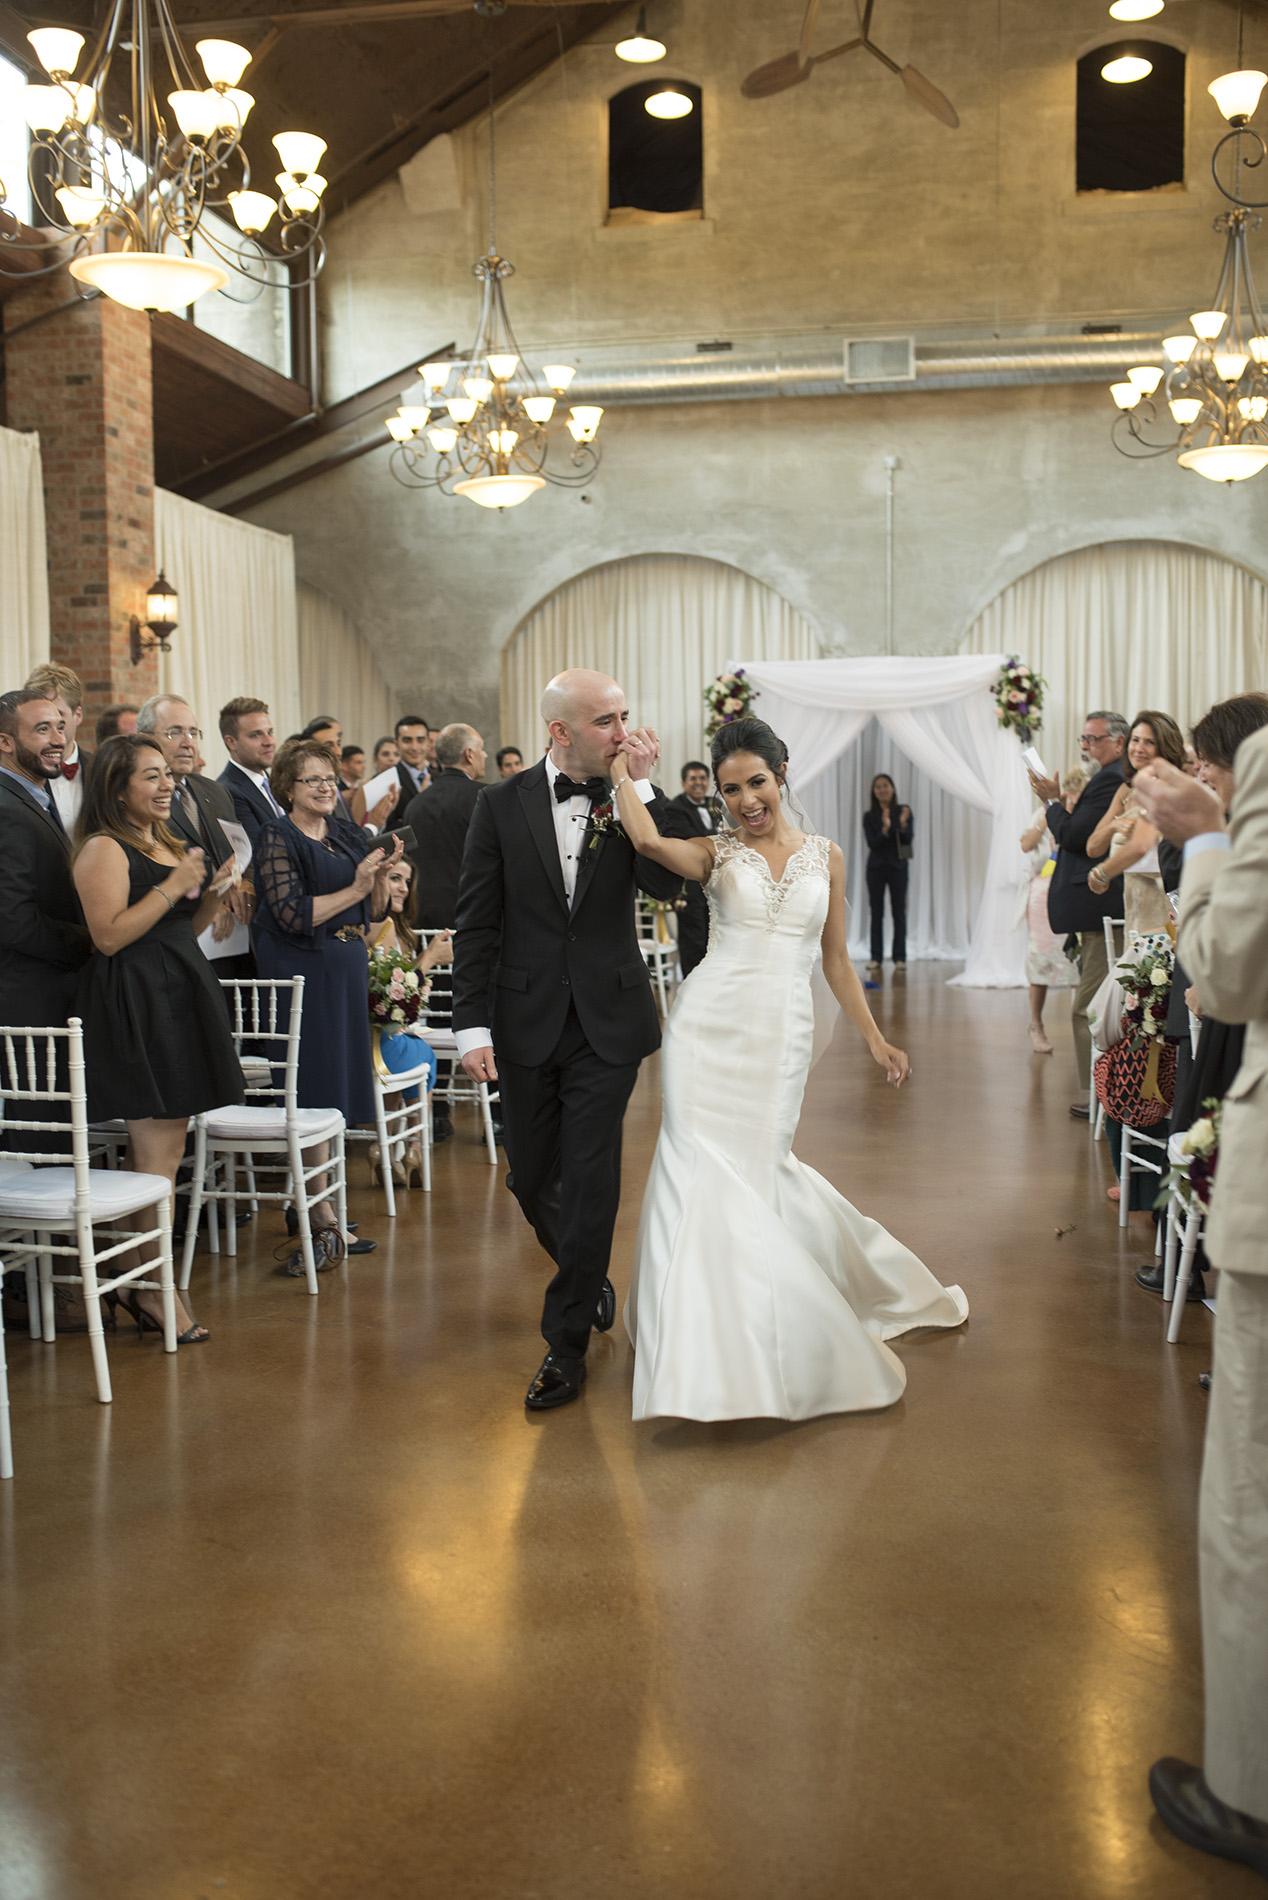 Houston-venue-Olde-Dobbin-Station-Romantic-Classic-Wedding-Photographer-066.jpg